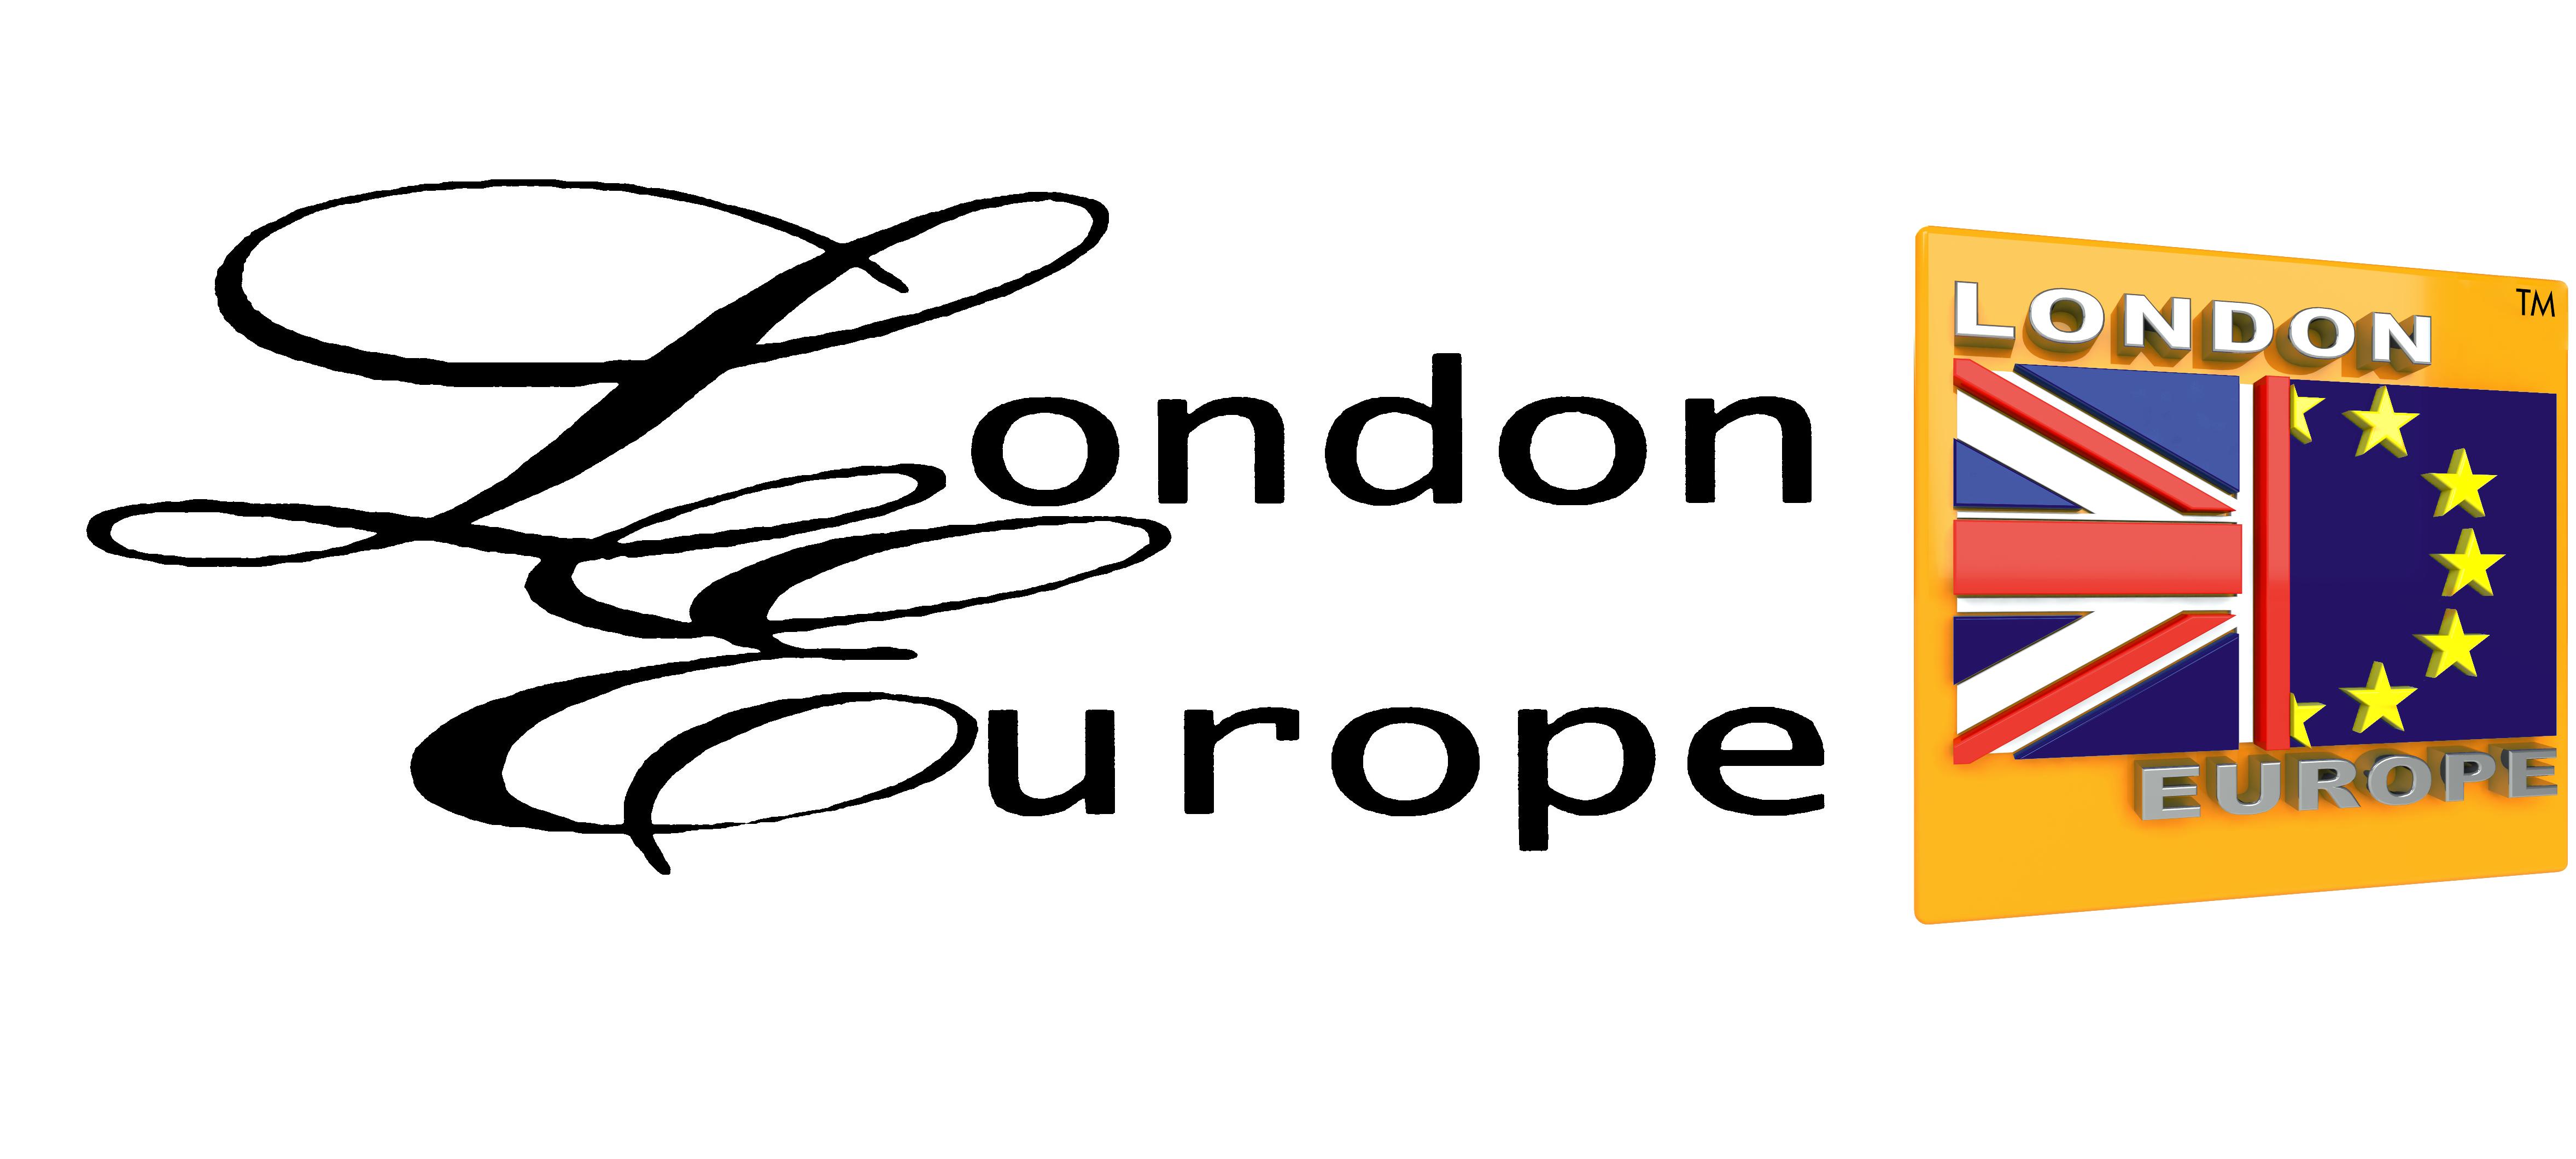 LONDON EUROPE